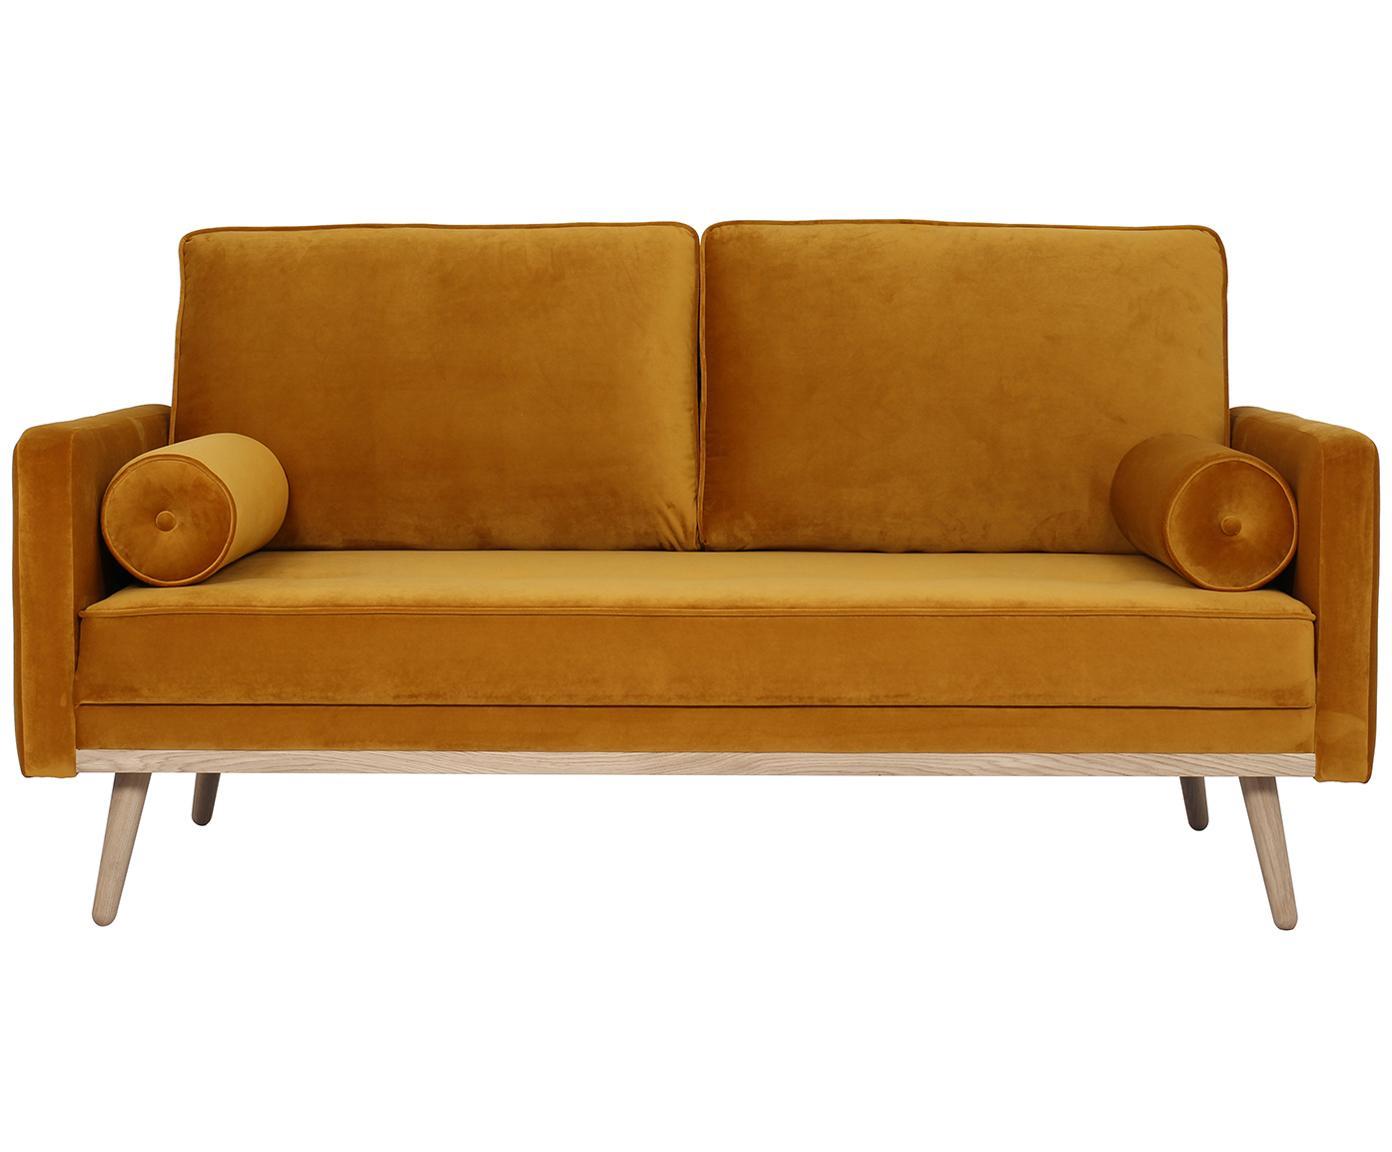 Fluwelen bank Saint (2-zits), Bekleding: fluweel (polyester), Frame: massief grenenhout, spaan, Bekleding: okergeel. Poten en frame: eikenhoutkleurig, B 169 x D 87 cm